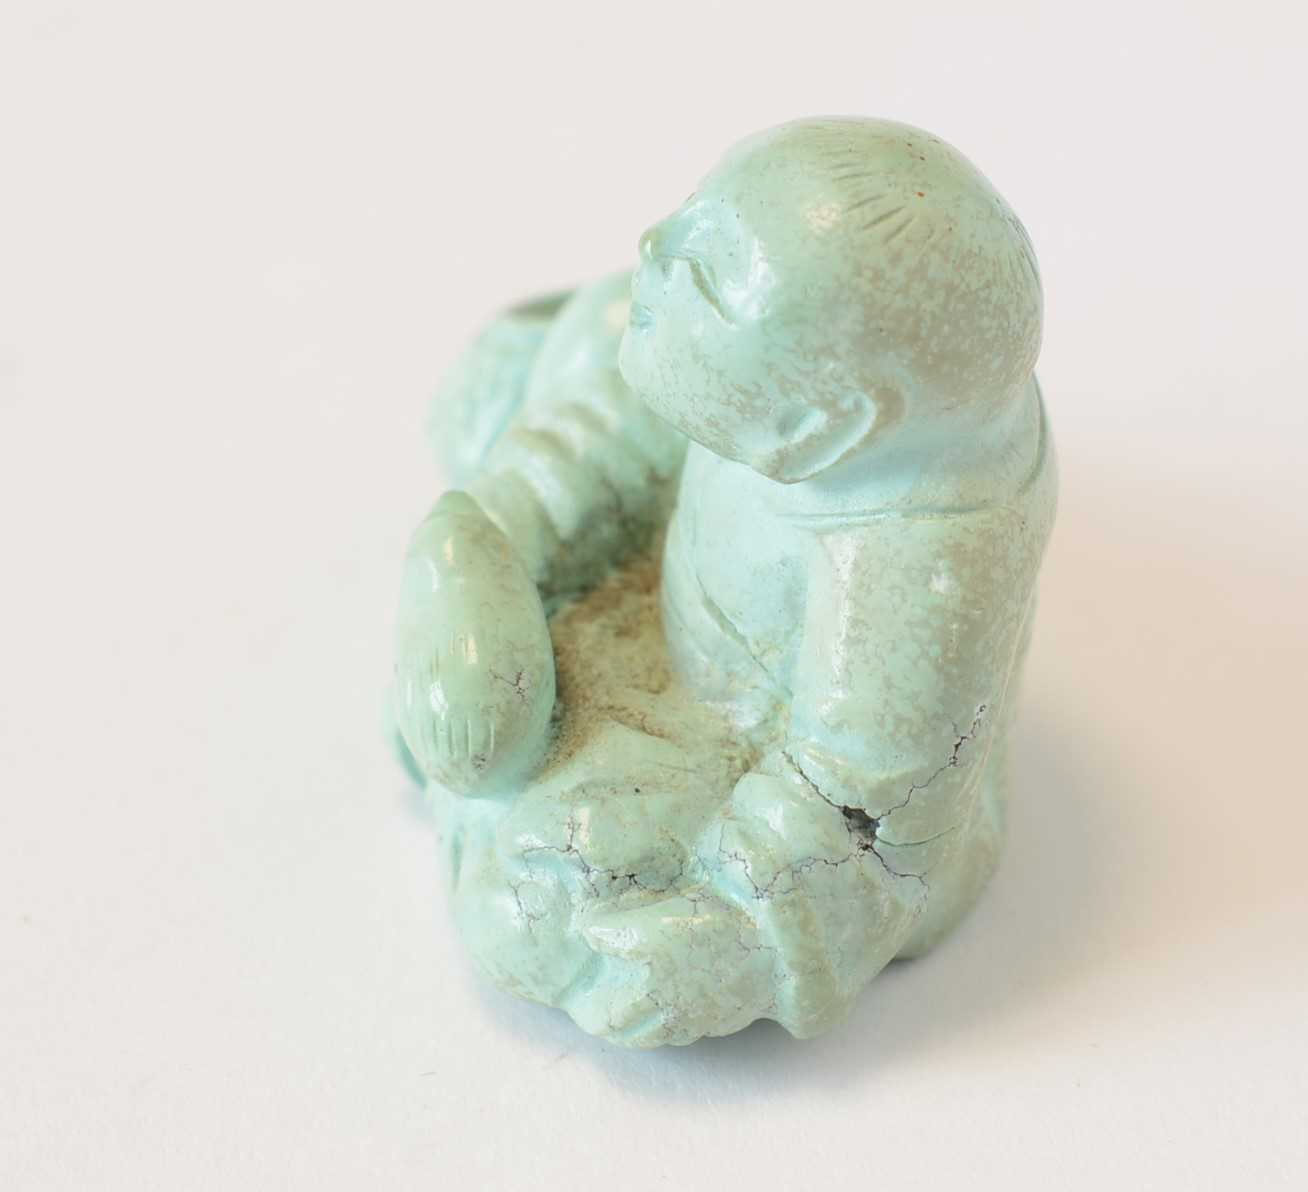 Chinese turquoise figure; jadeite pendant, hardstone cup - Image 12 of 27